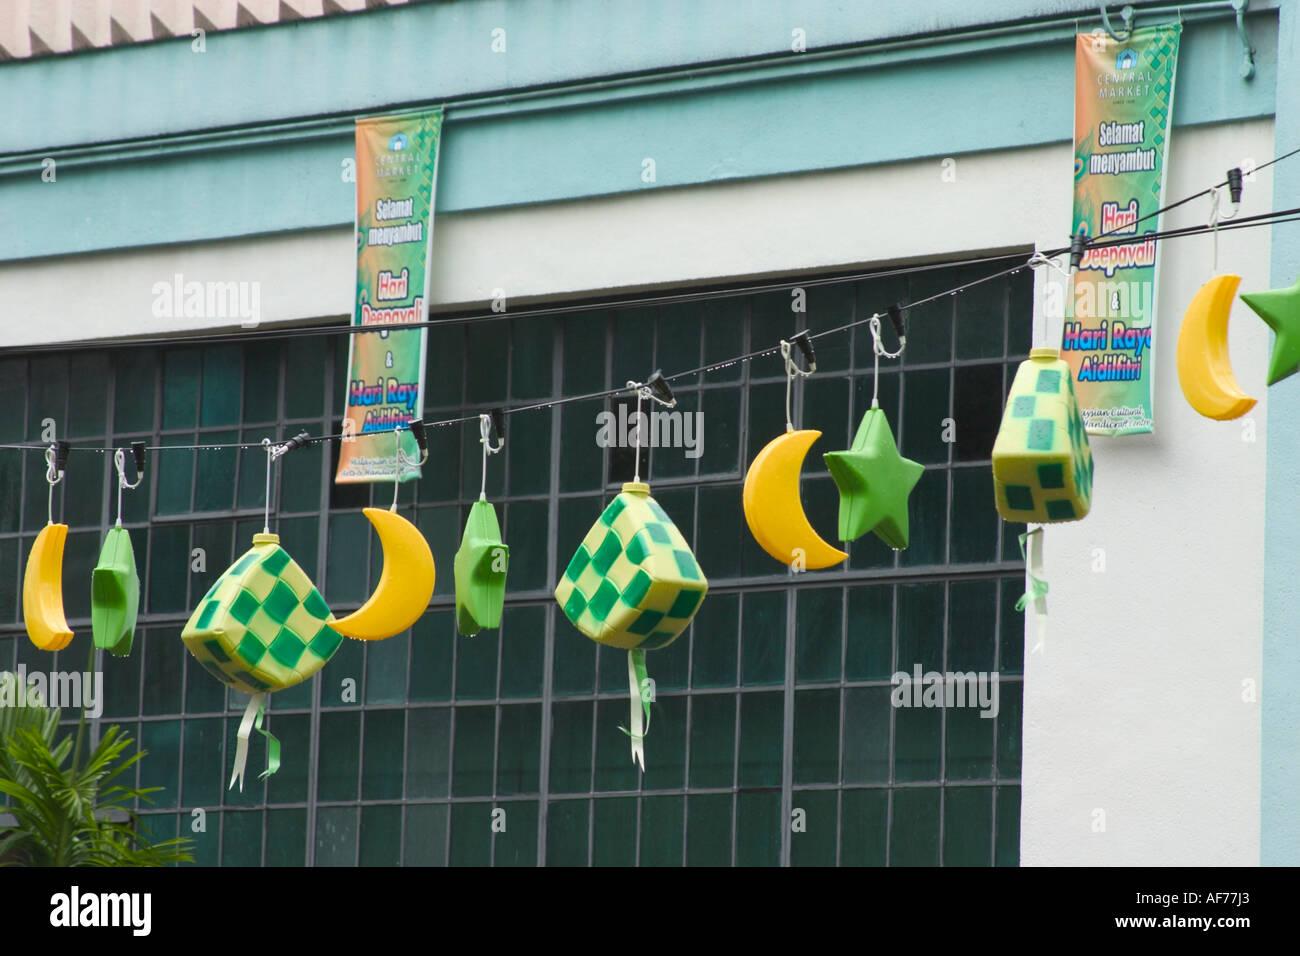 Amazing Raya Eid Al-Fitr Decorations - decorations-hanging-in-mid-air-to-celebrate-hari-raya-festival-or-AF77J3  Snapshot_443245 .jpg